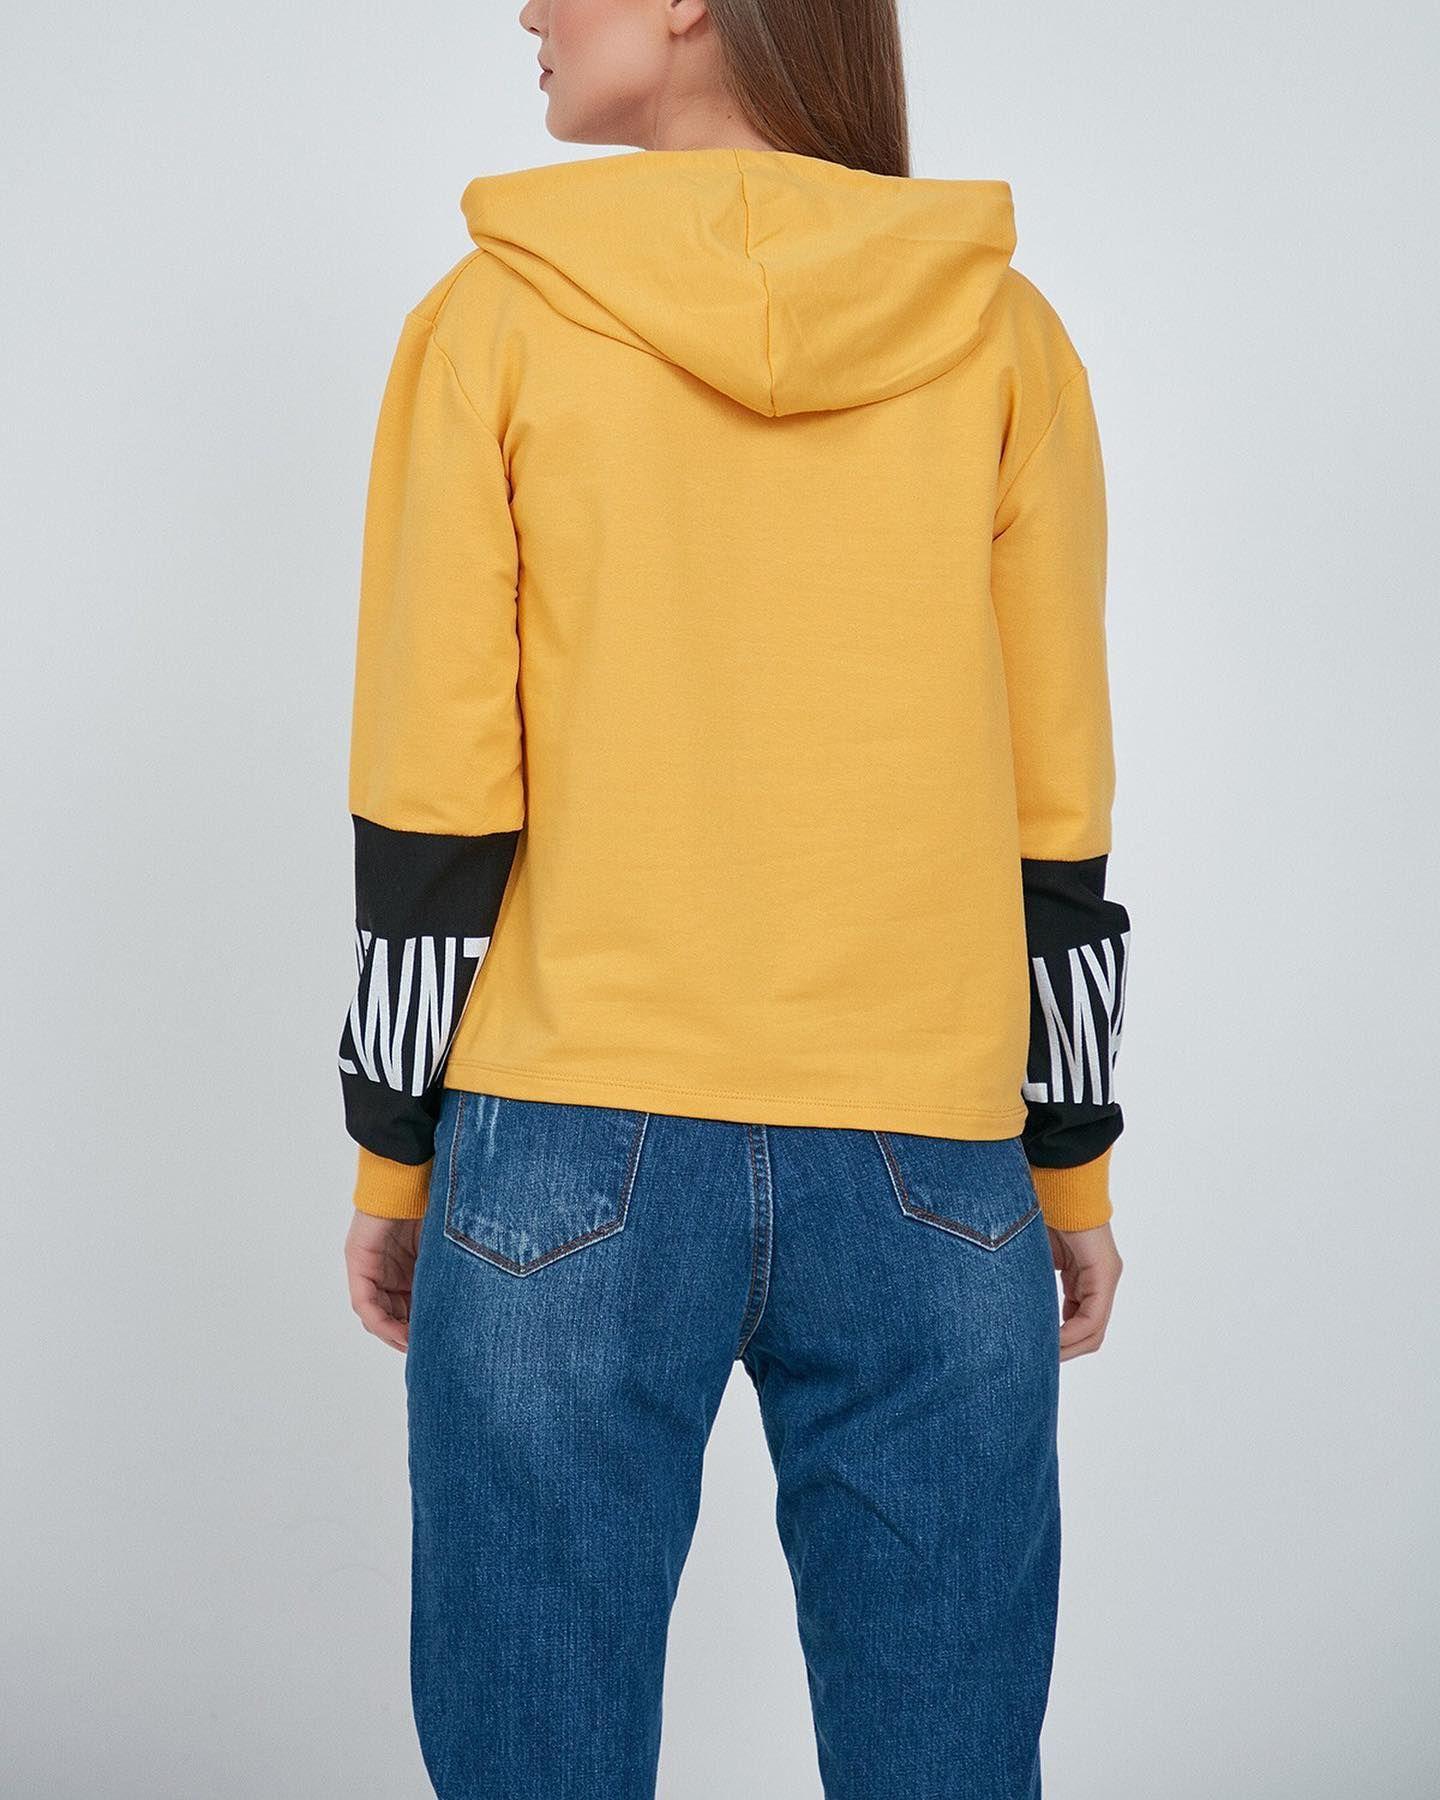 Yazi Baskili Kapsonlu Love Ip Detay Sweatshirt Urun Kodu Frknsa0082 Urun Fiyati 62 95 Vikingjeans Vikingjeanswoman Tr In 2020 Fashion Women Jeans Women